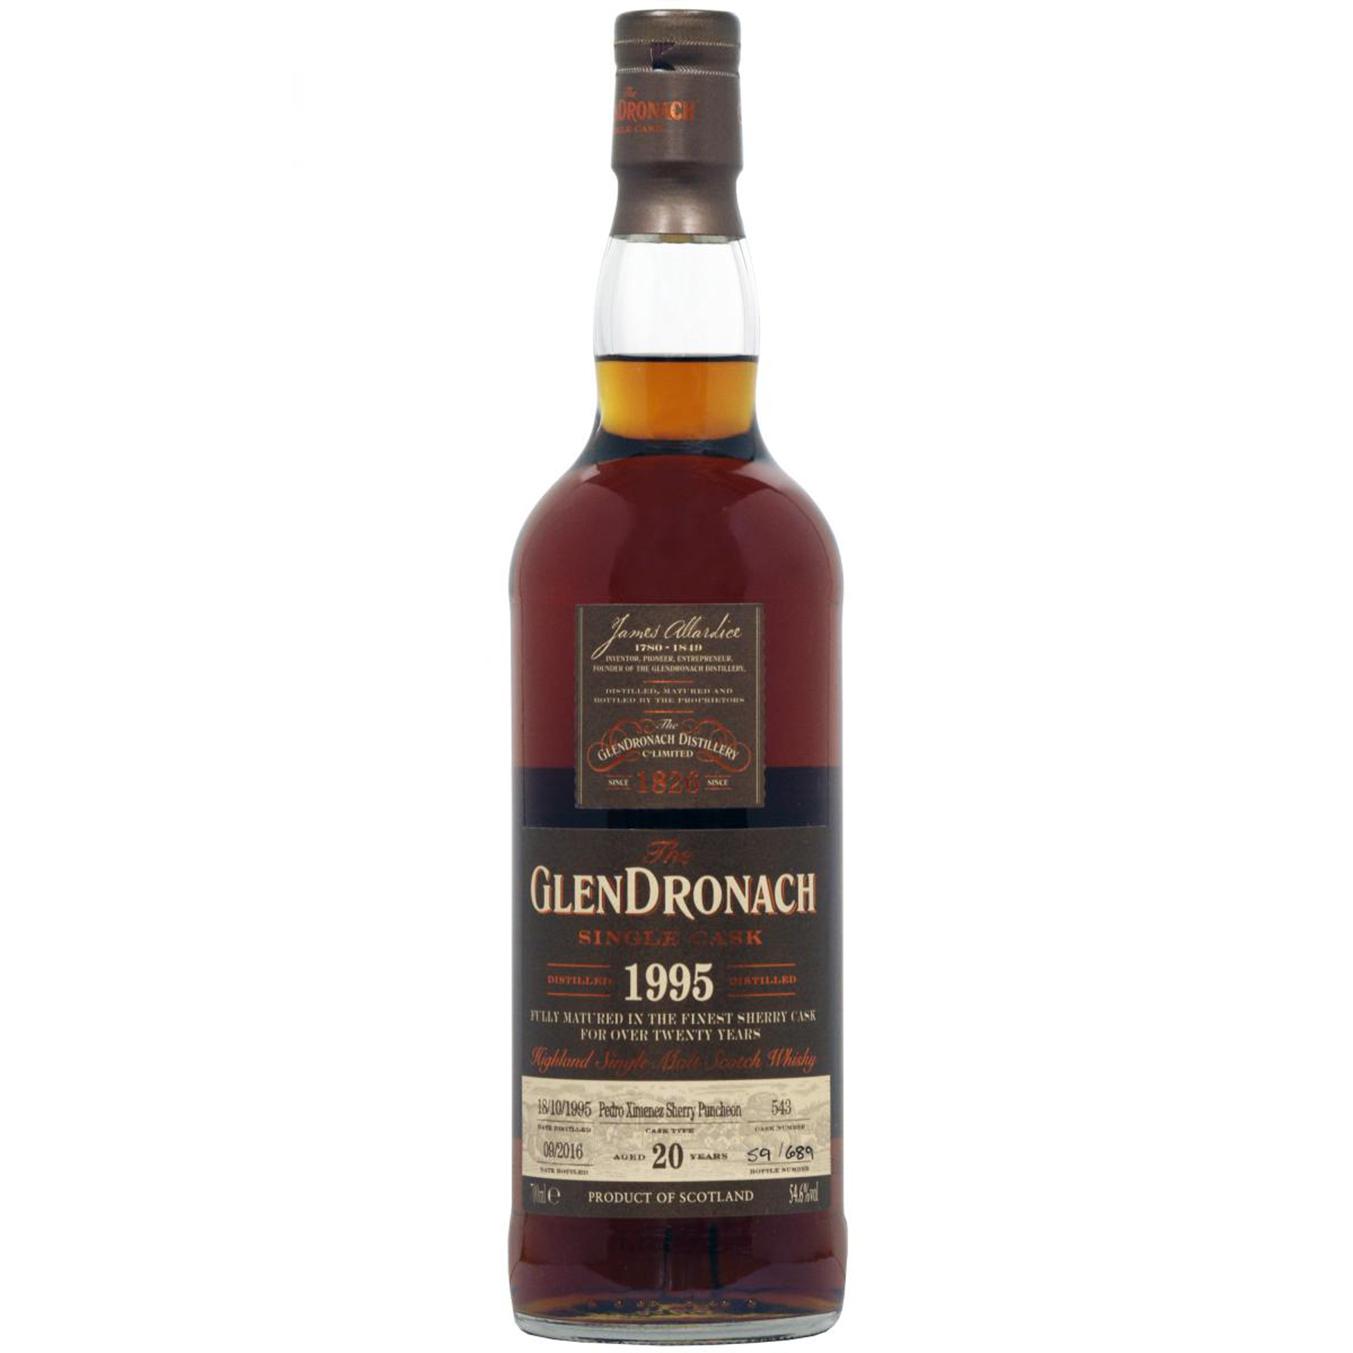 Glendronach 1995 20 years – cask #543